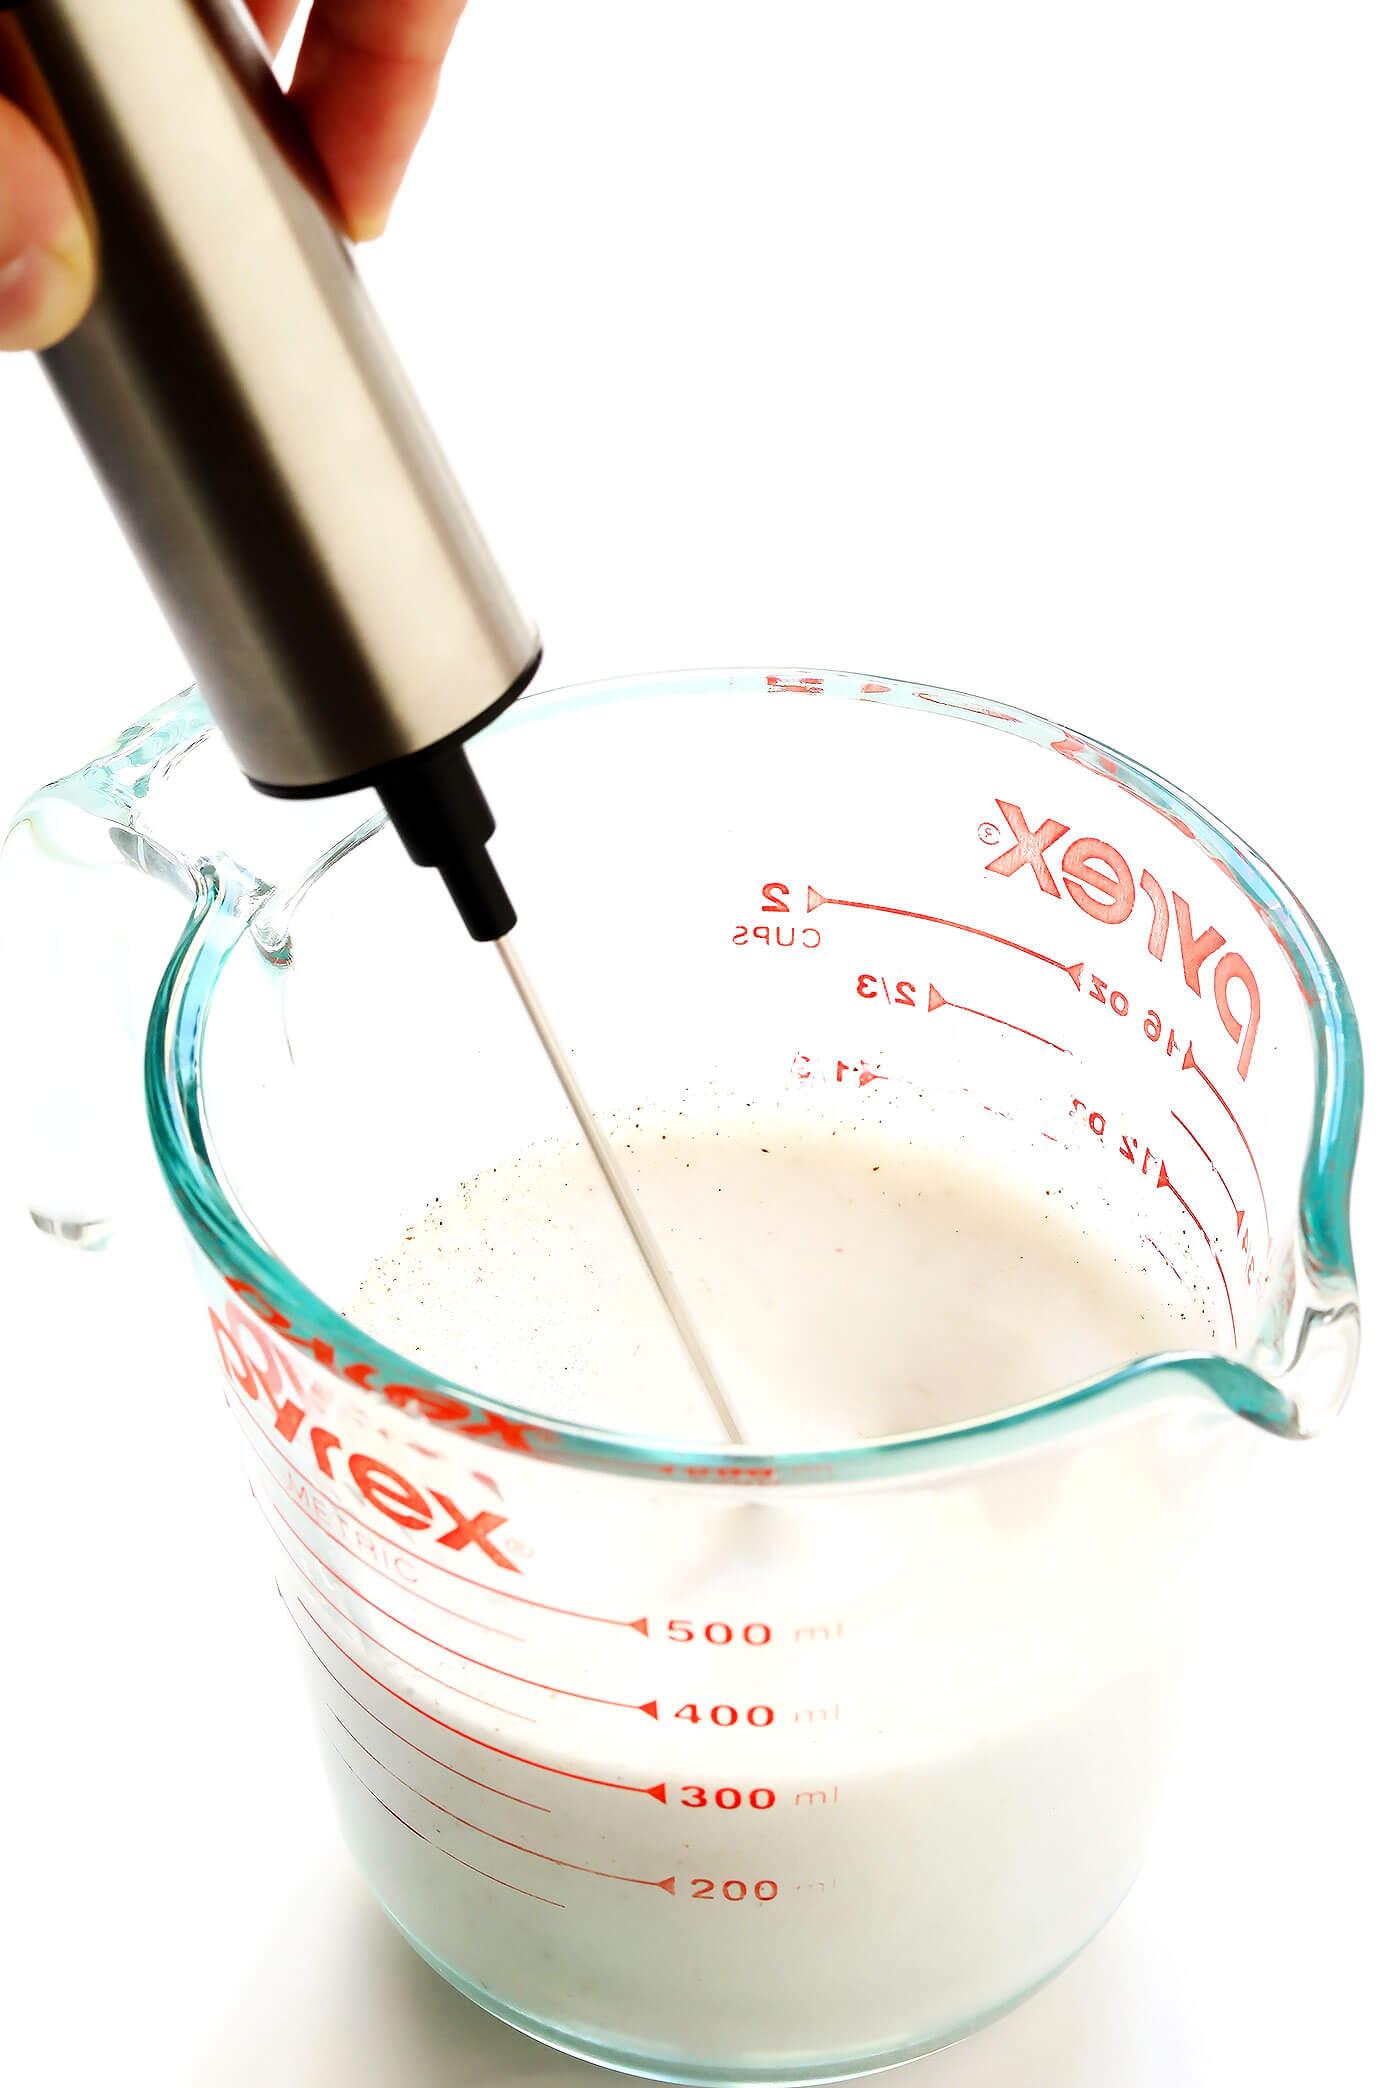 How To Make Pumpkin Foam for Iced Coffee (Like Starbucks)